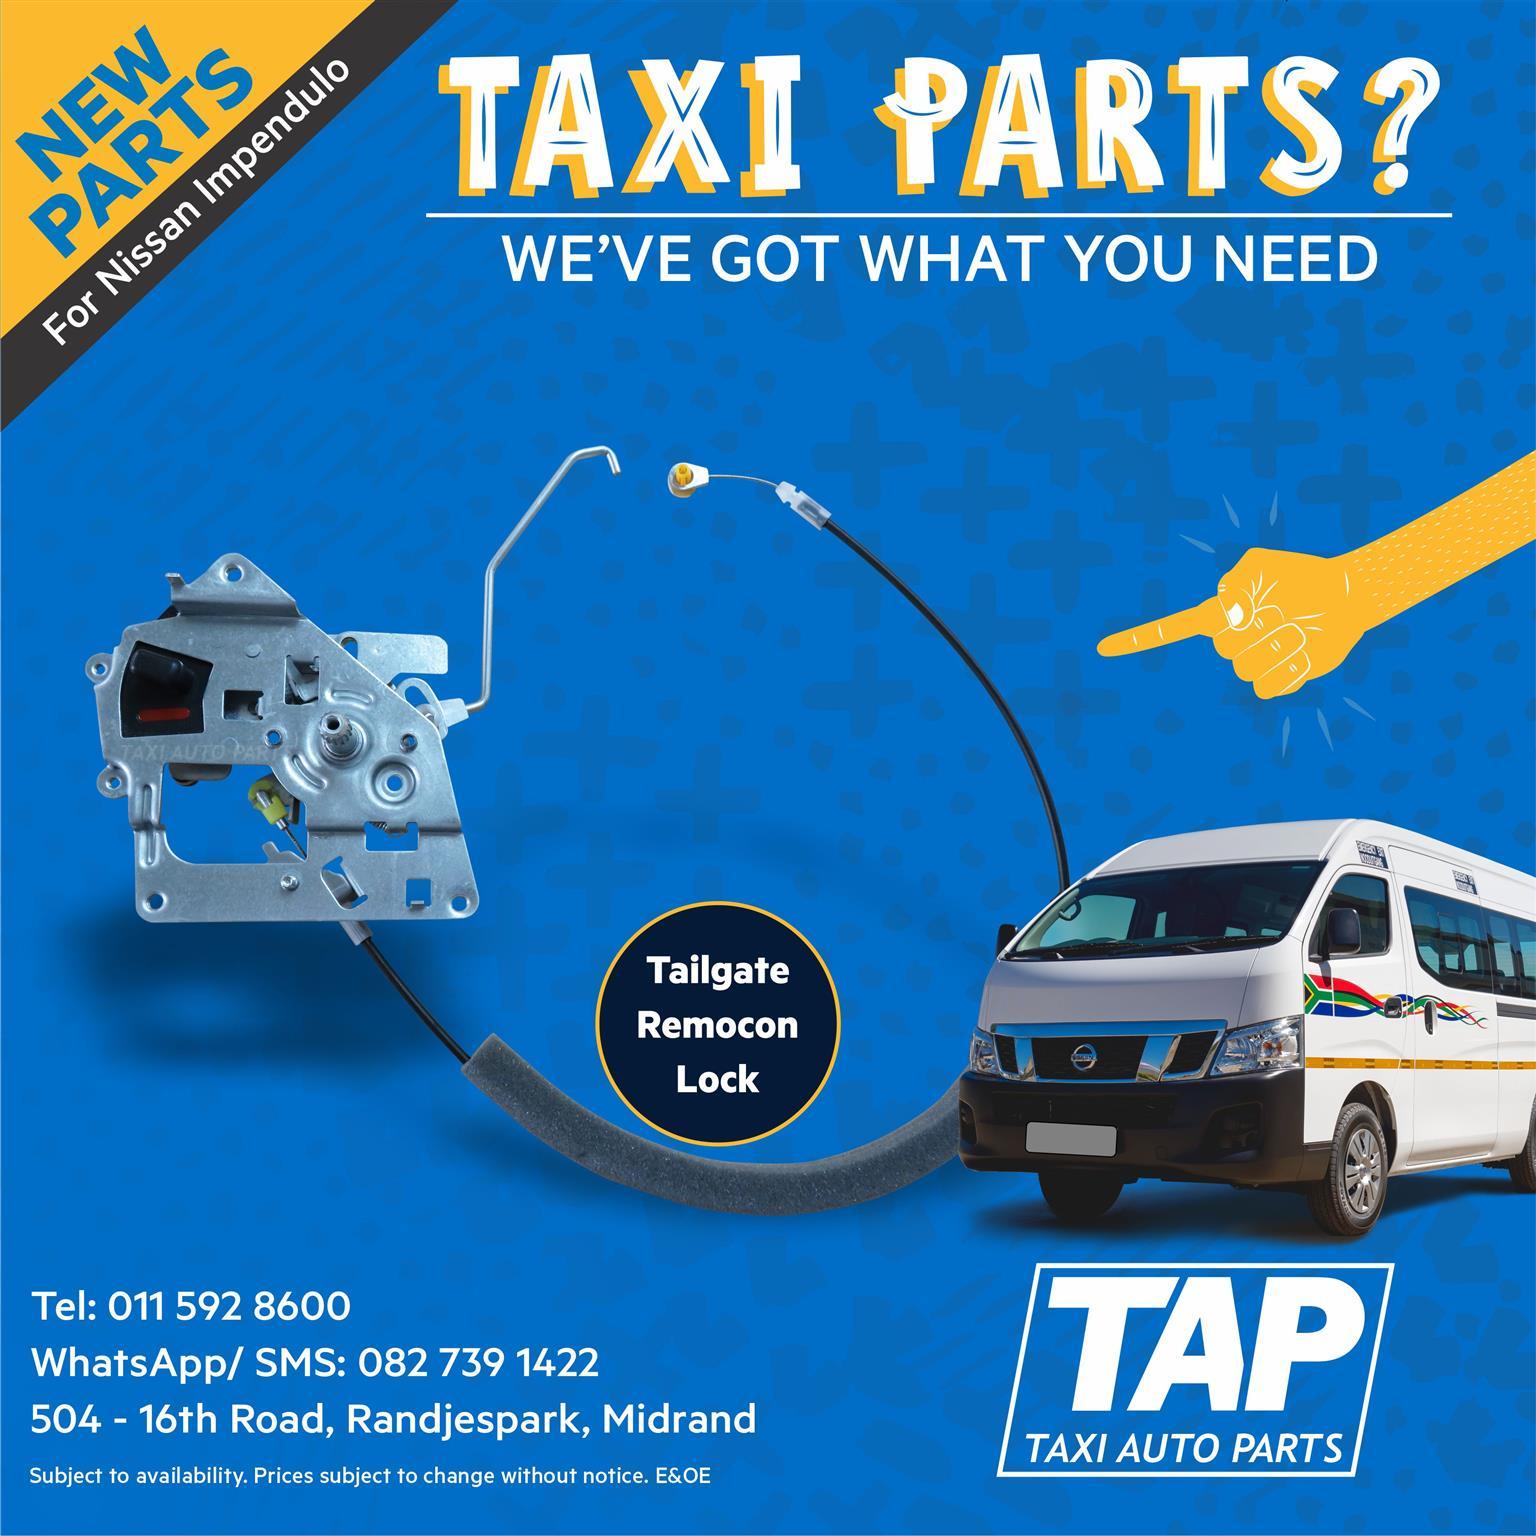 NEW Tailgate Remocon Lock for Nissan Impendulo - Taxi Auto Parts - TAP